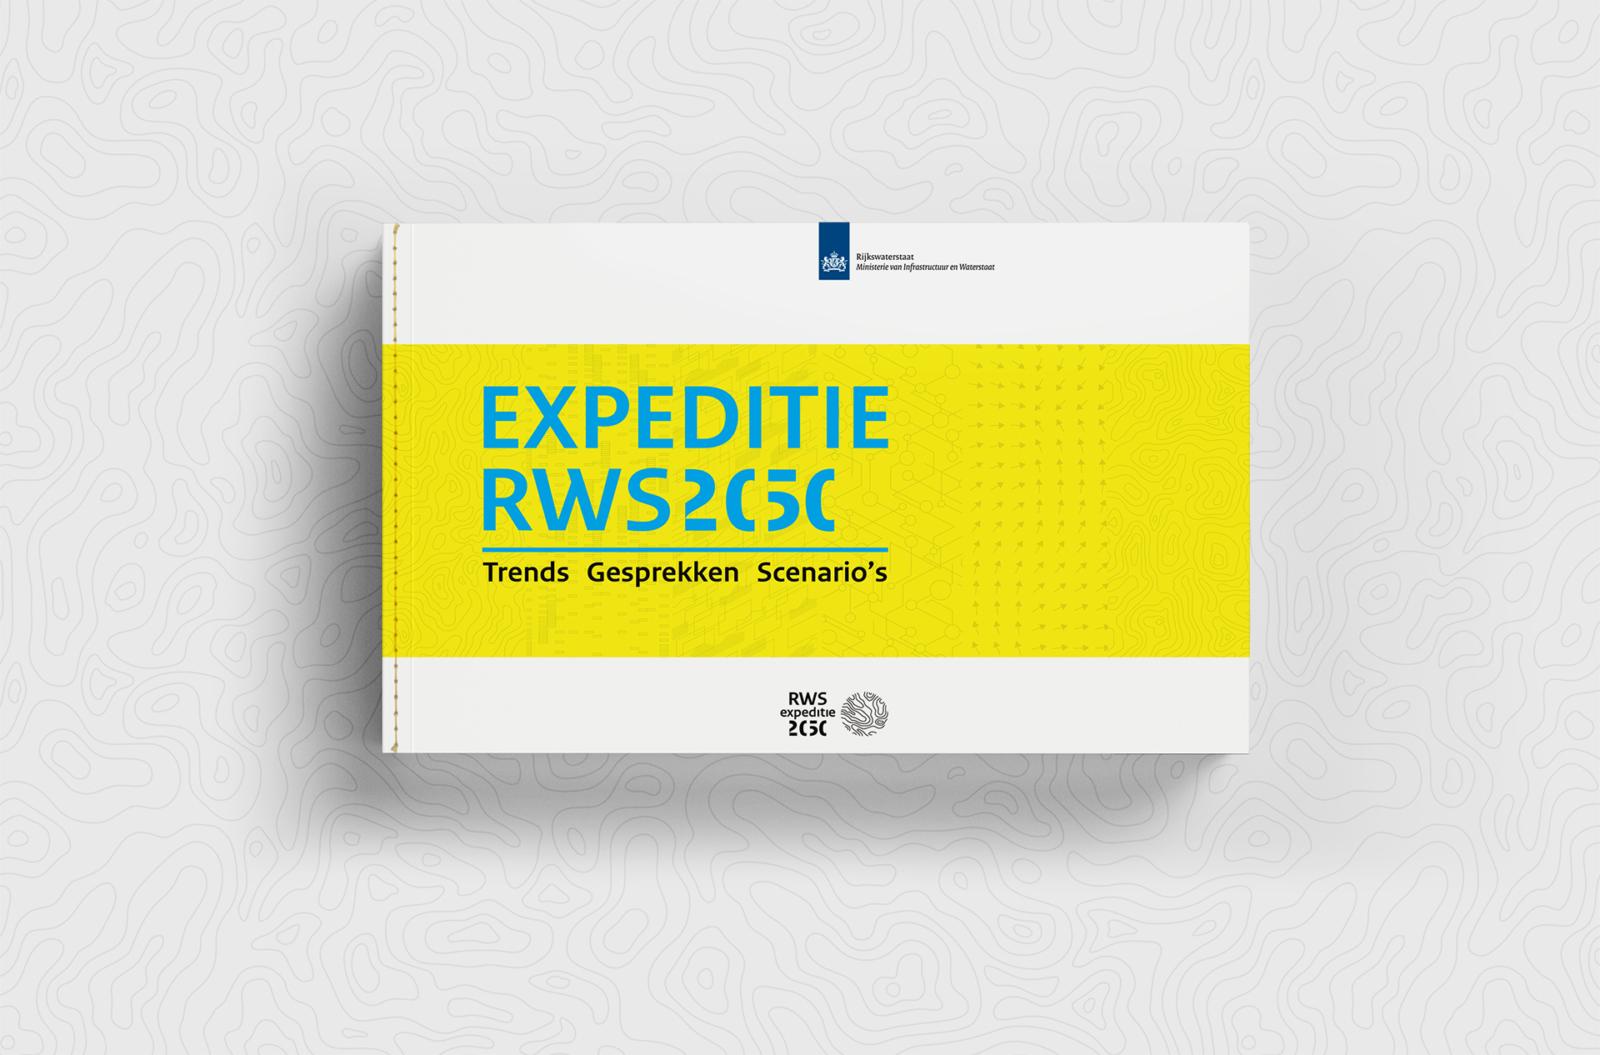 Expeditie 2050